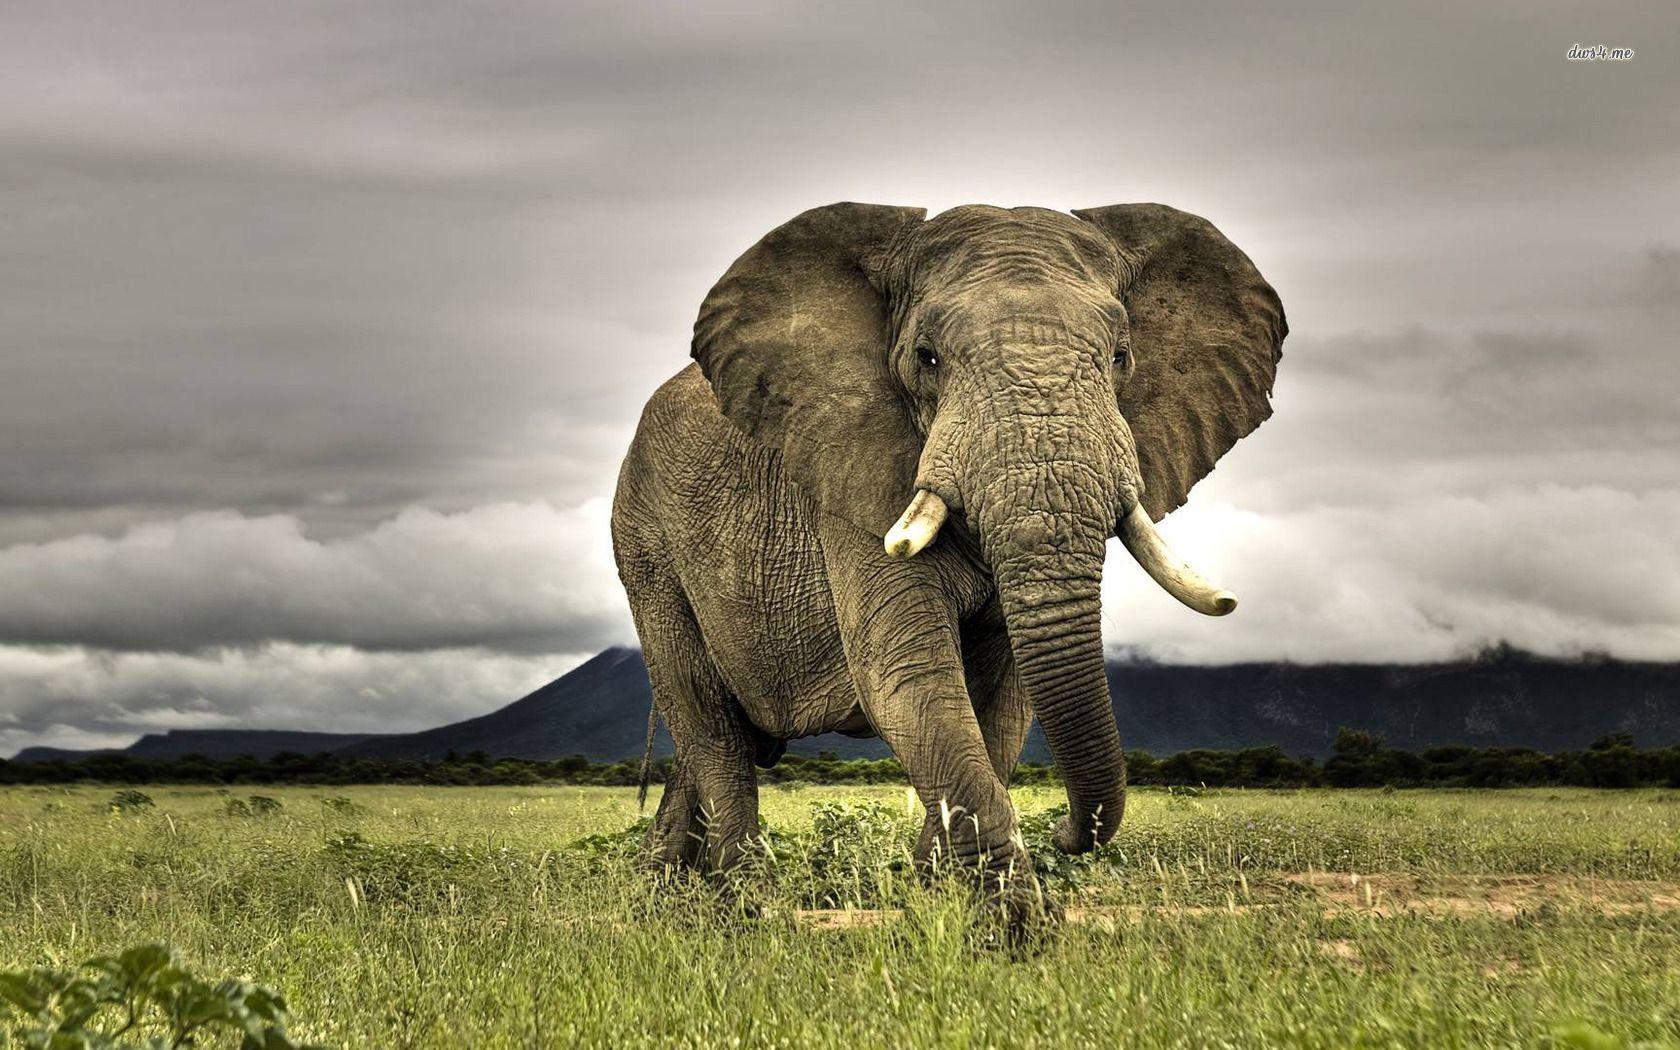 African Elephant African Elephant Wallpaper 1280x800 African Elephant Wallpaper Elephant Wallpaper Elephant Phone Wallpaper Bull Elephant